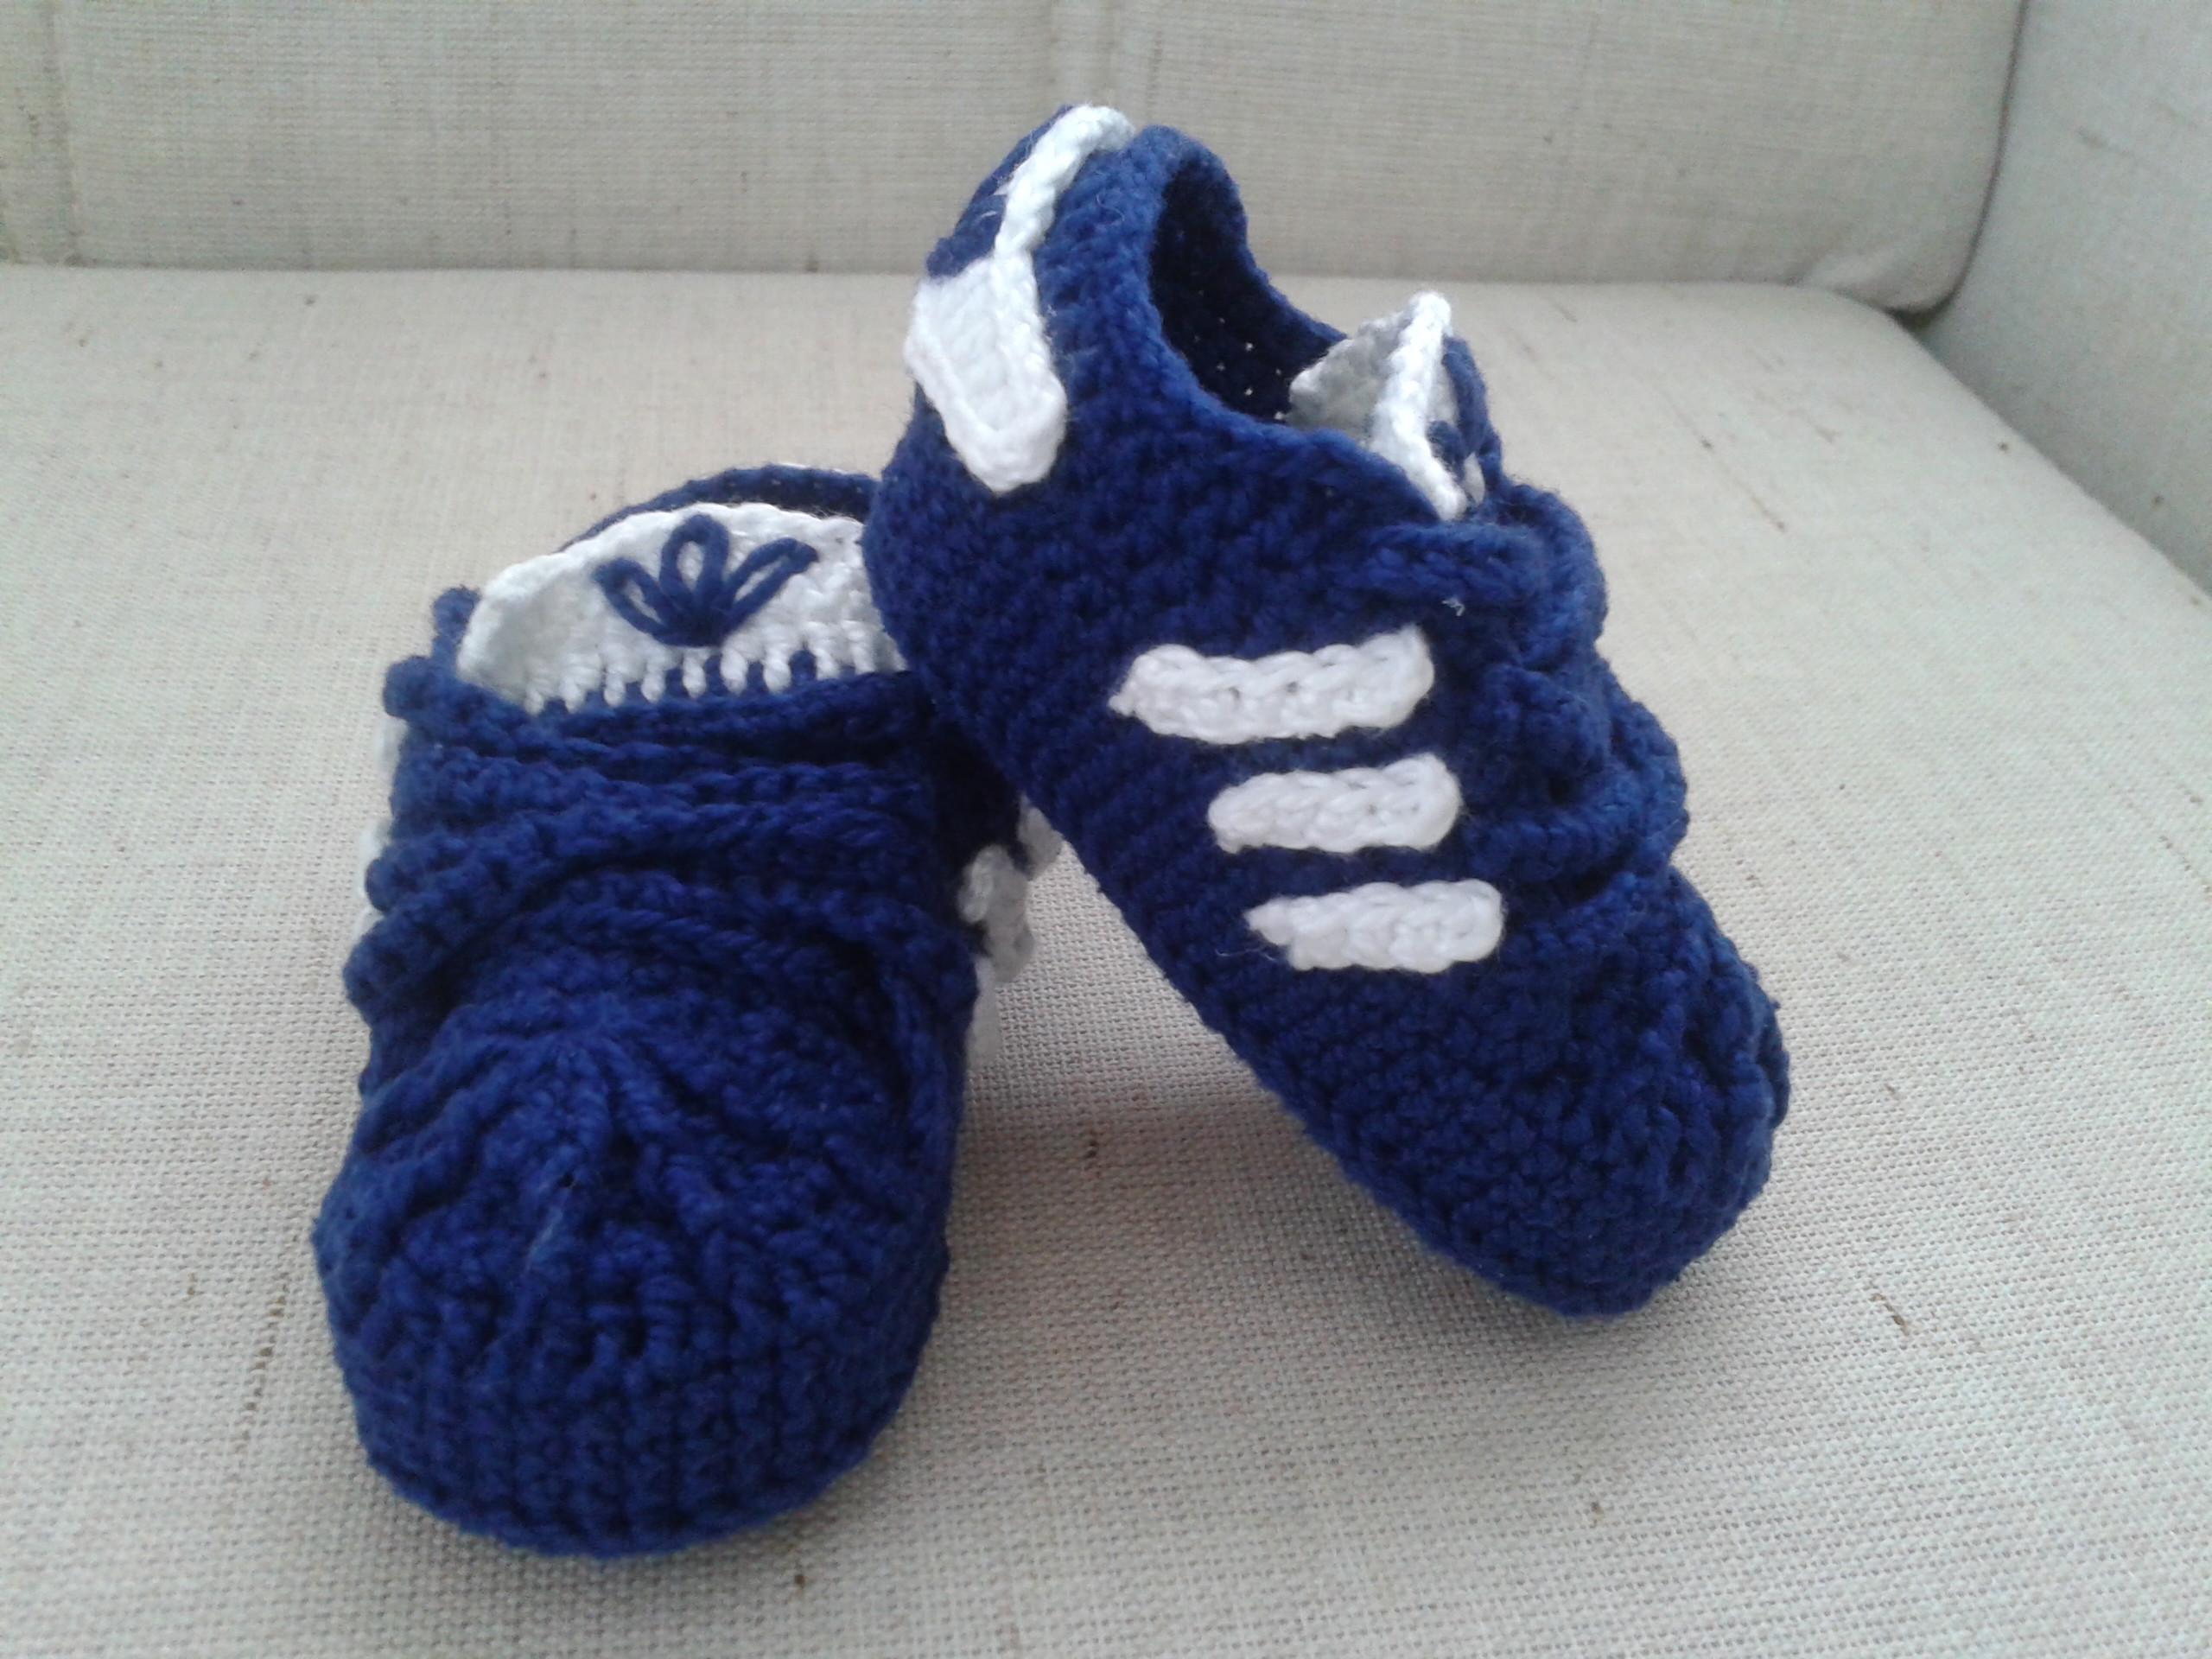 Tênis Adidas de Crochê para Bebês  9f1898b3af9